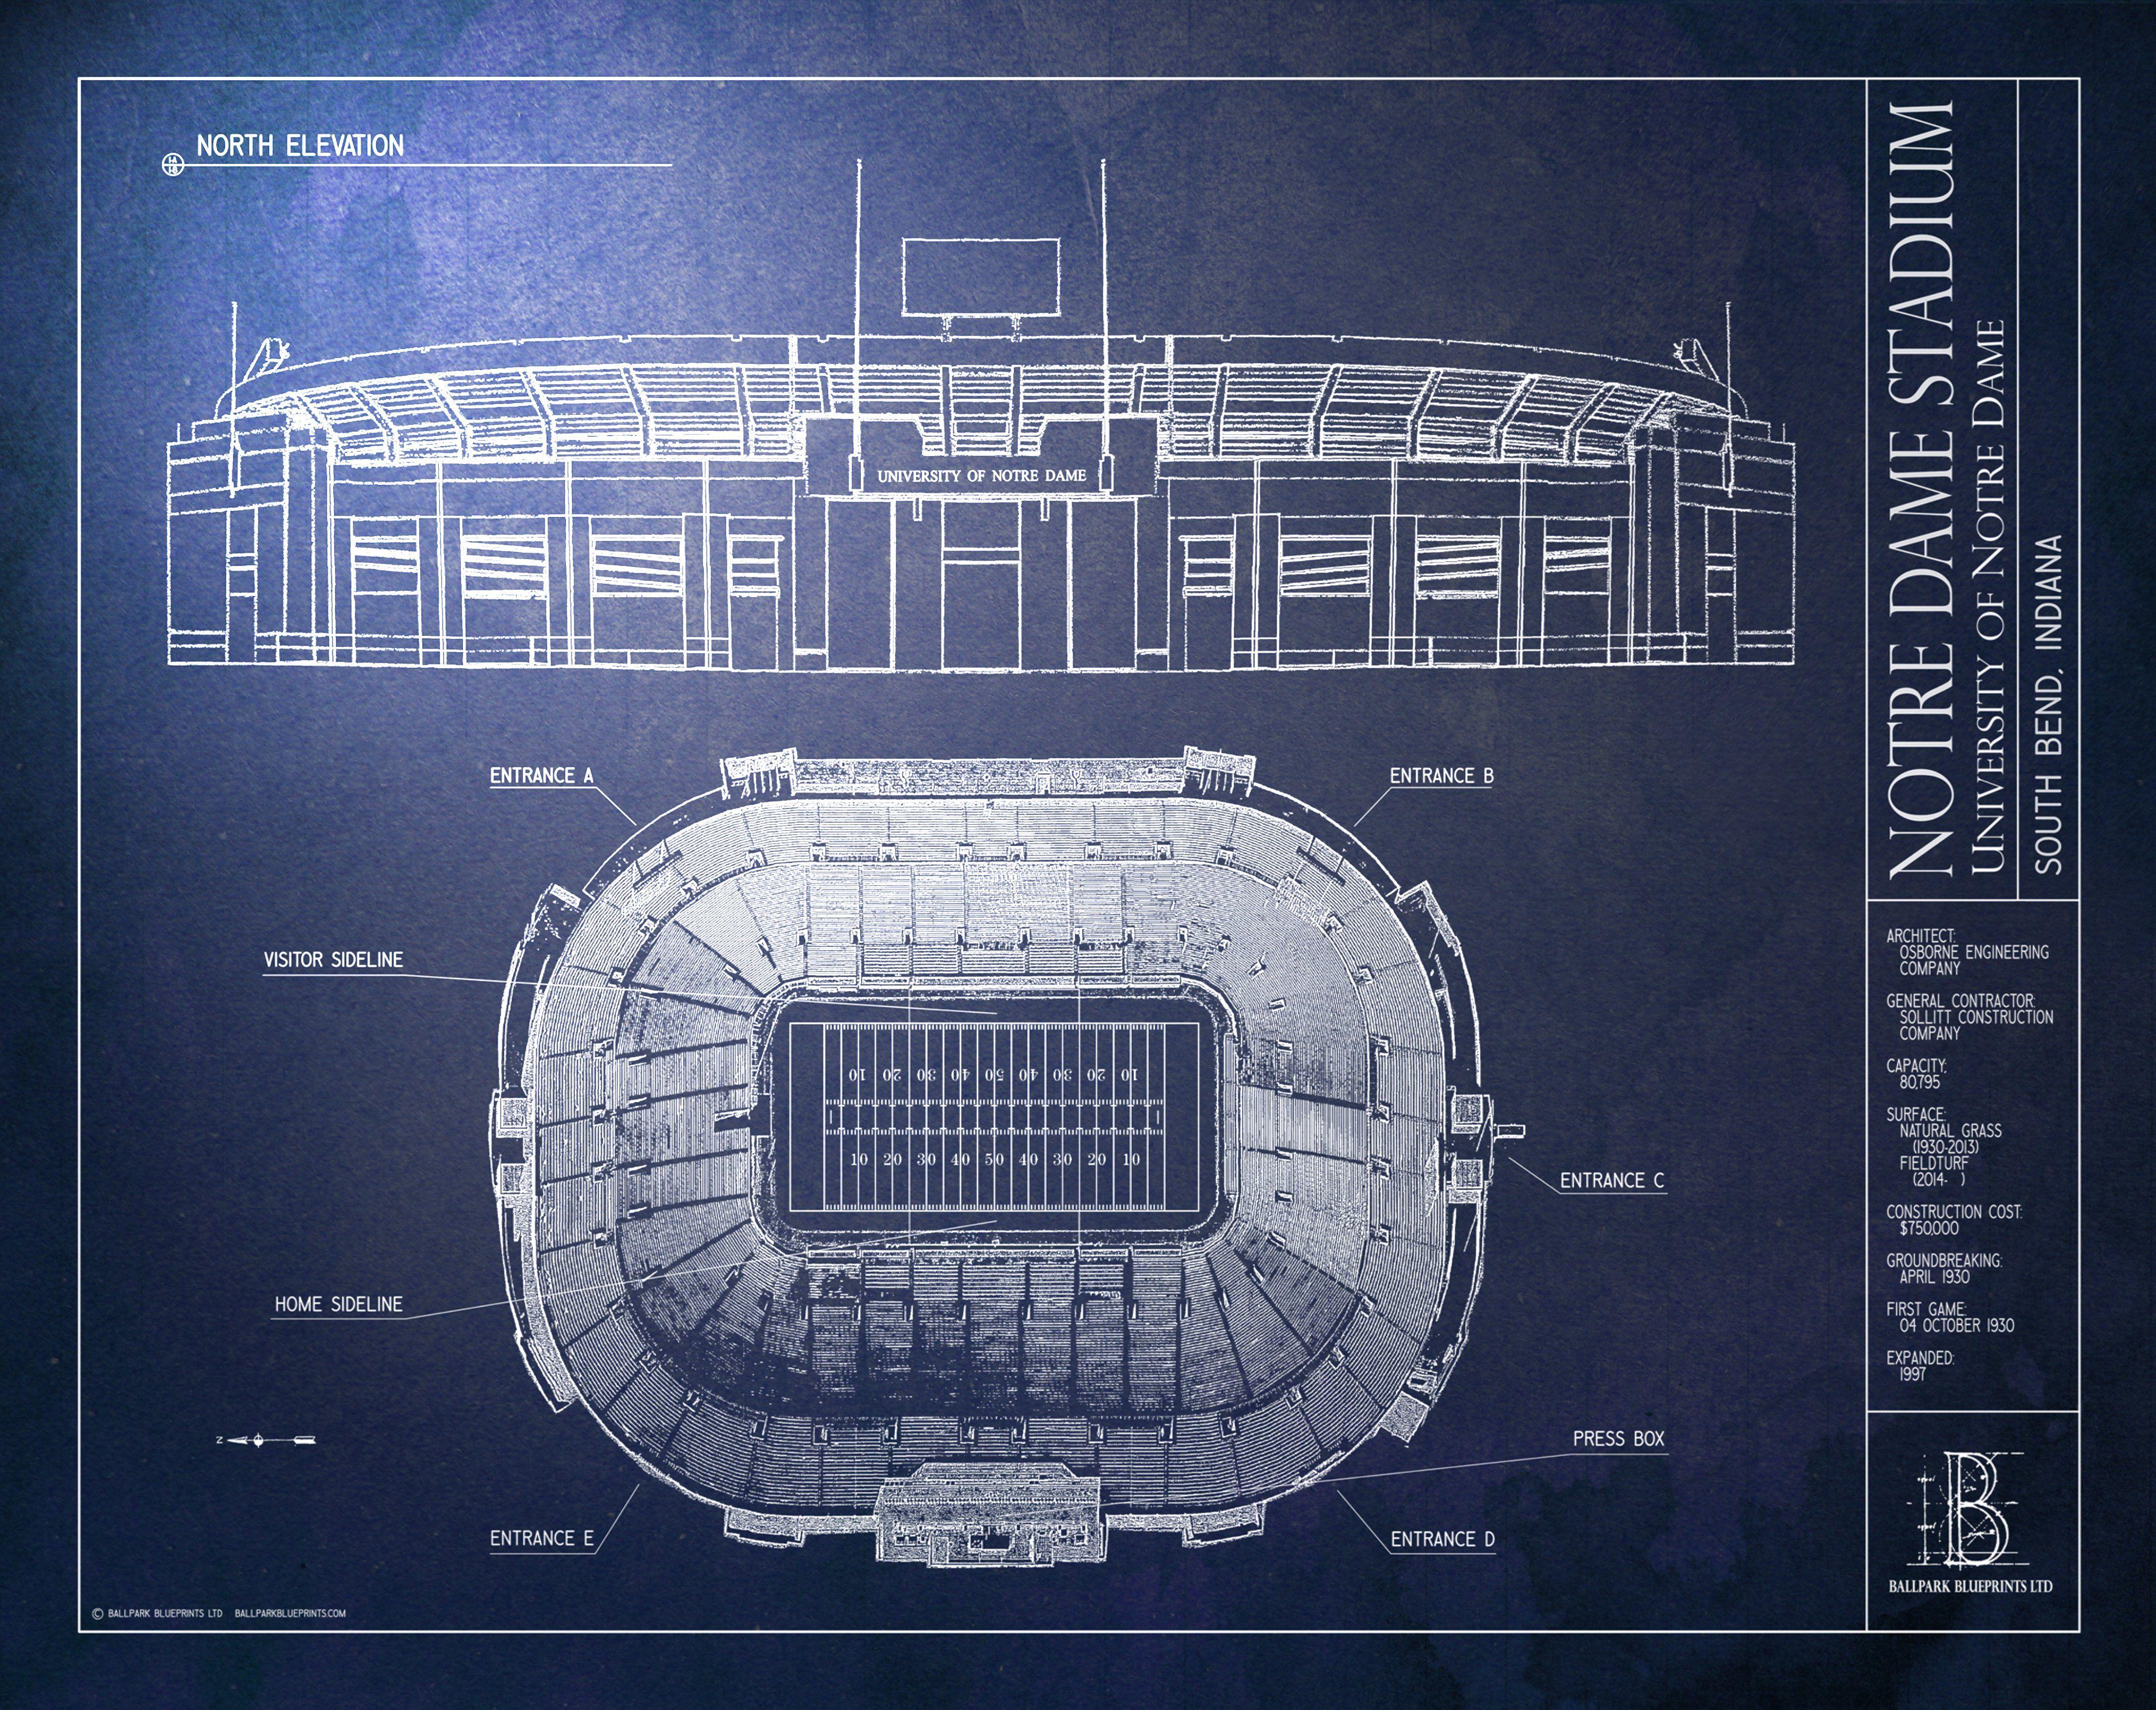 Notre Dame Stadium University Of Notre Dame Murals Your Way Large Framed Prints Notre Dame